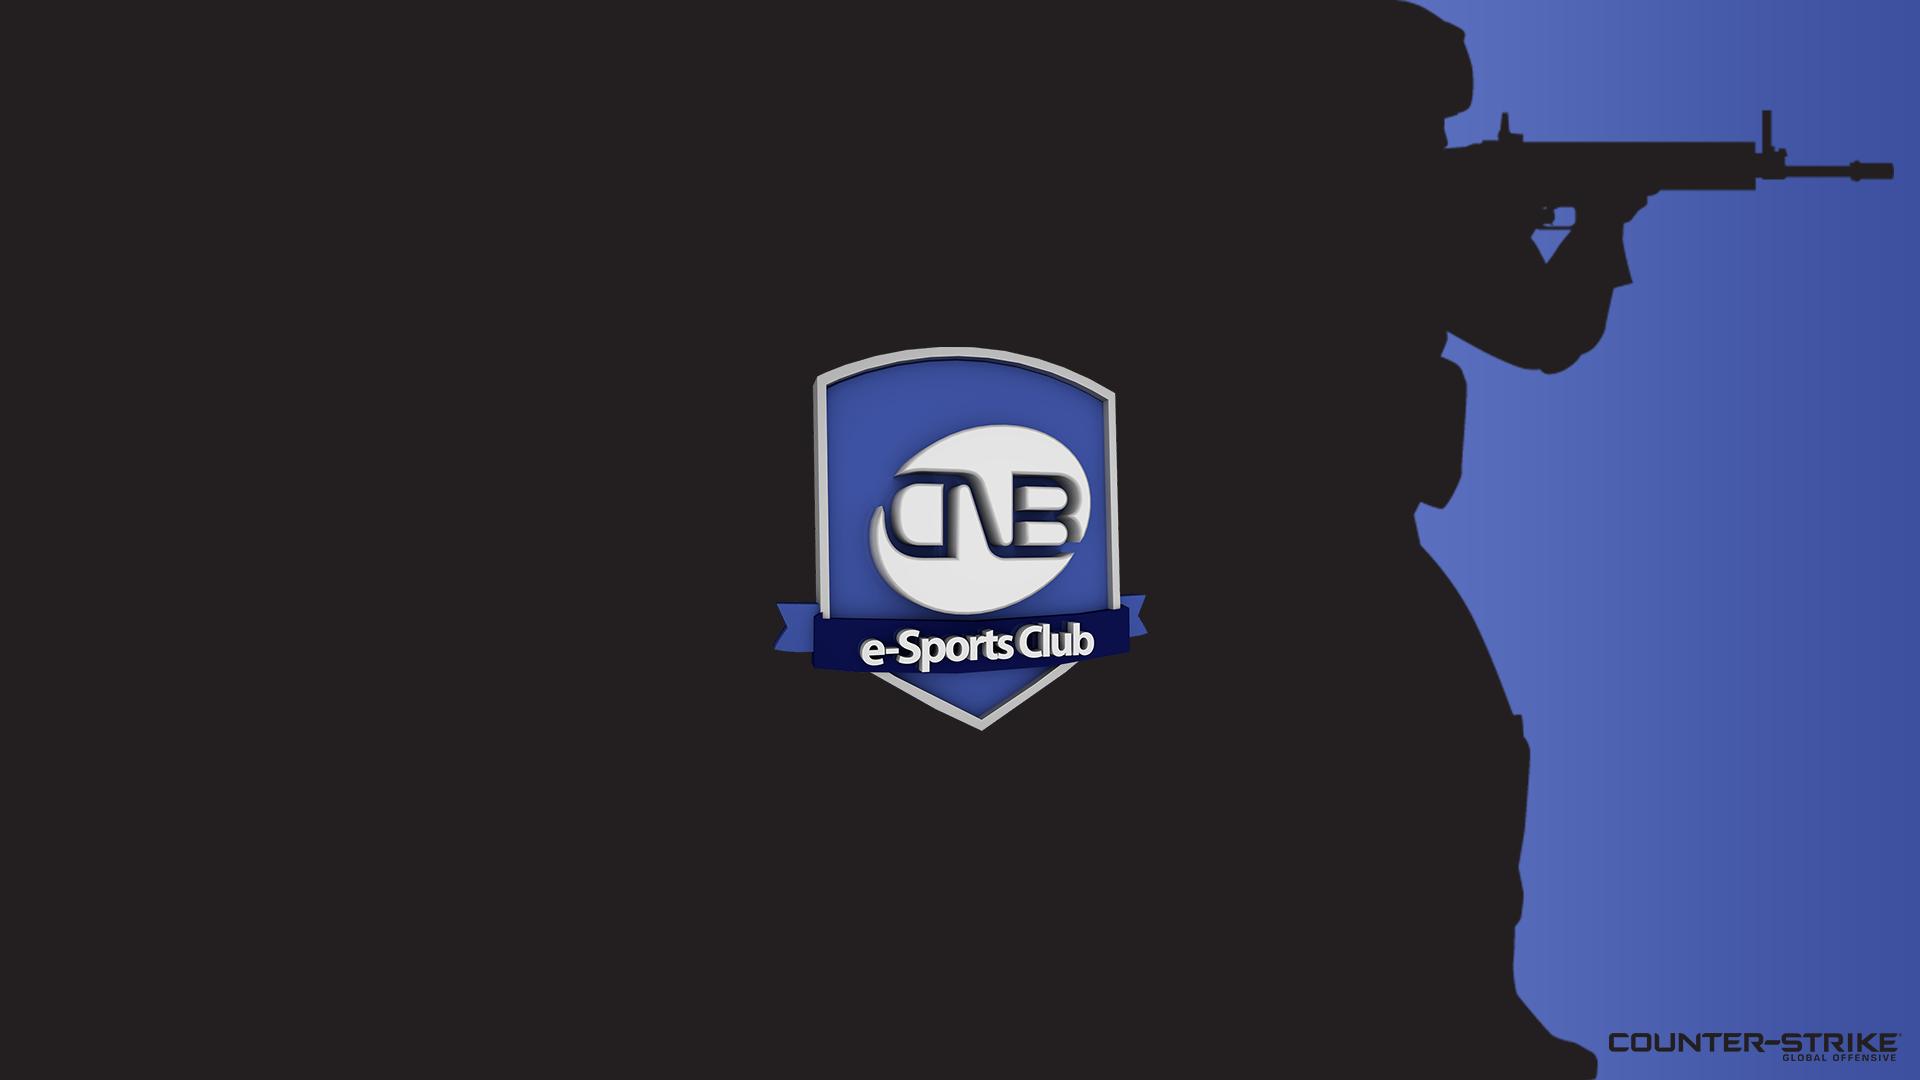 Black with logo - CNB